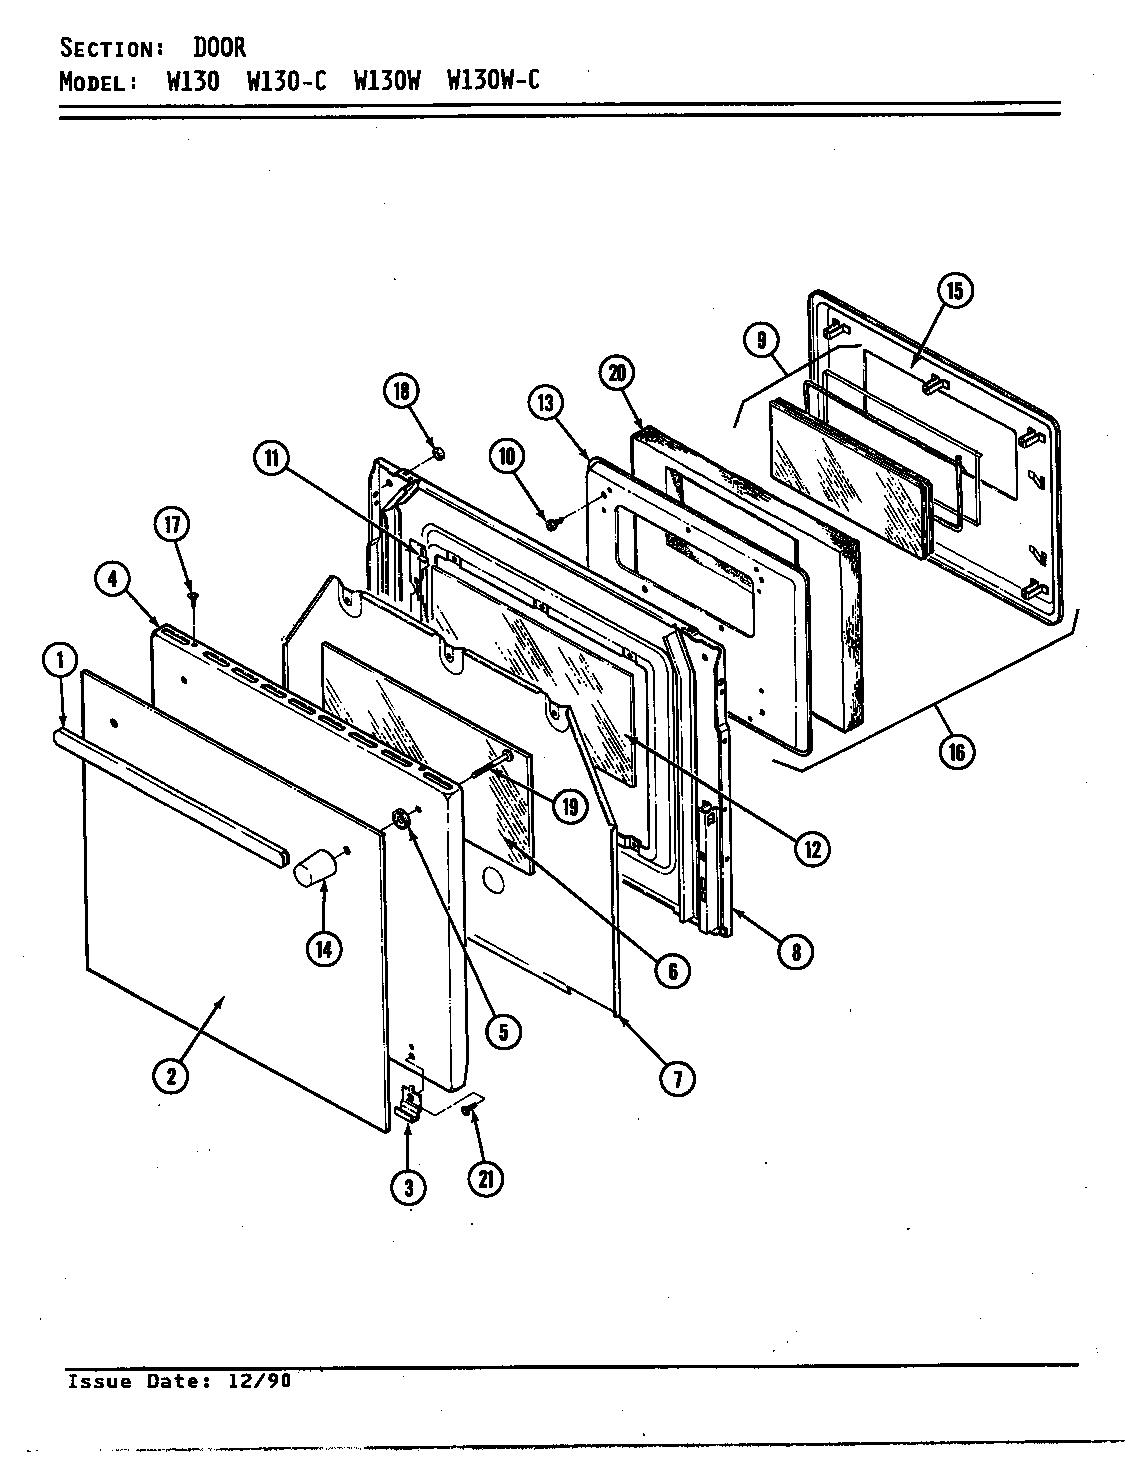 Bmw n52 wiring harness diagram further bmw n20 n26 n52 n55 and mini cooper n13 n16